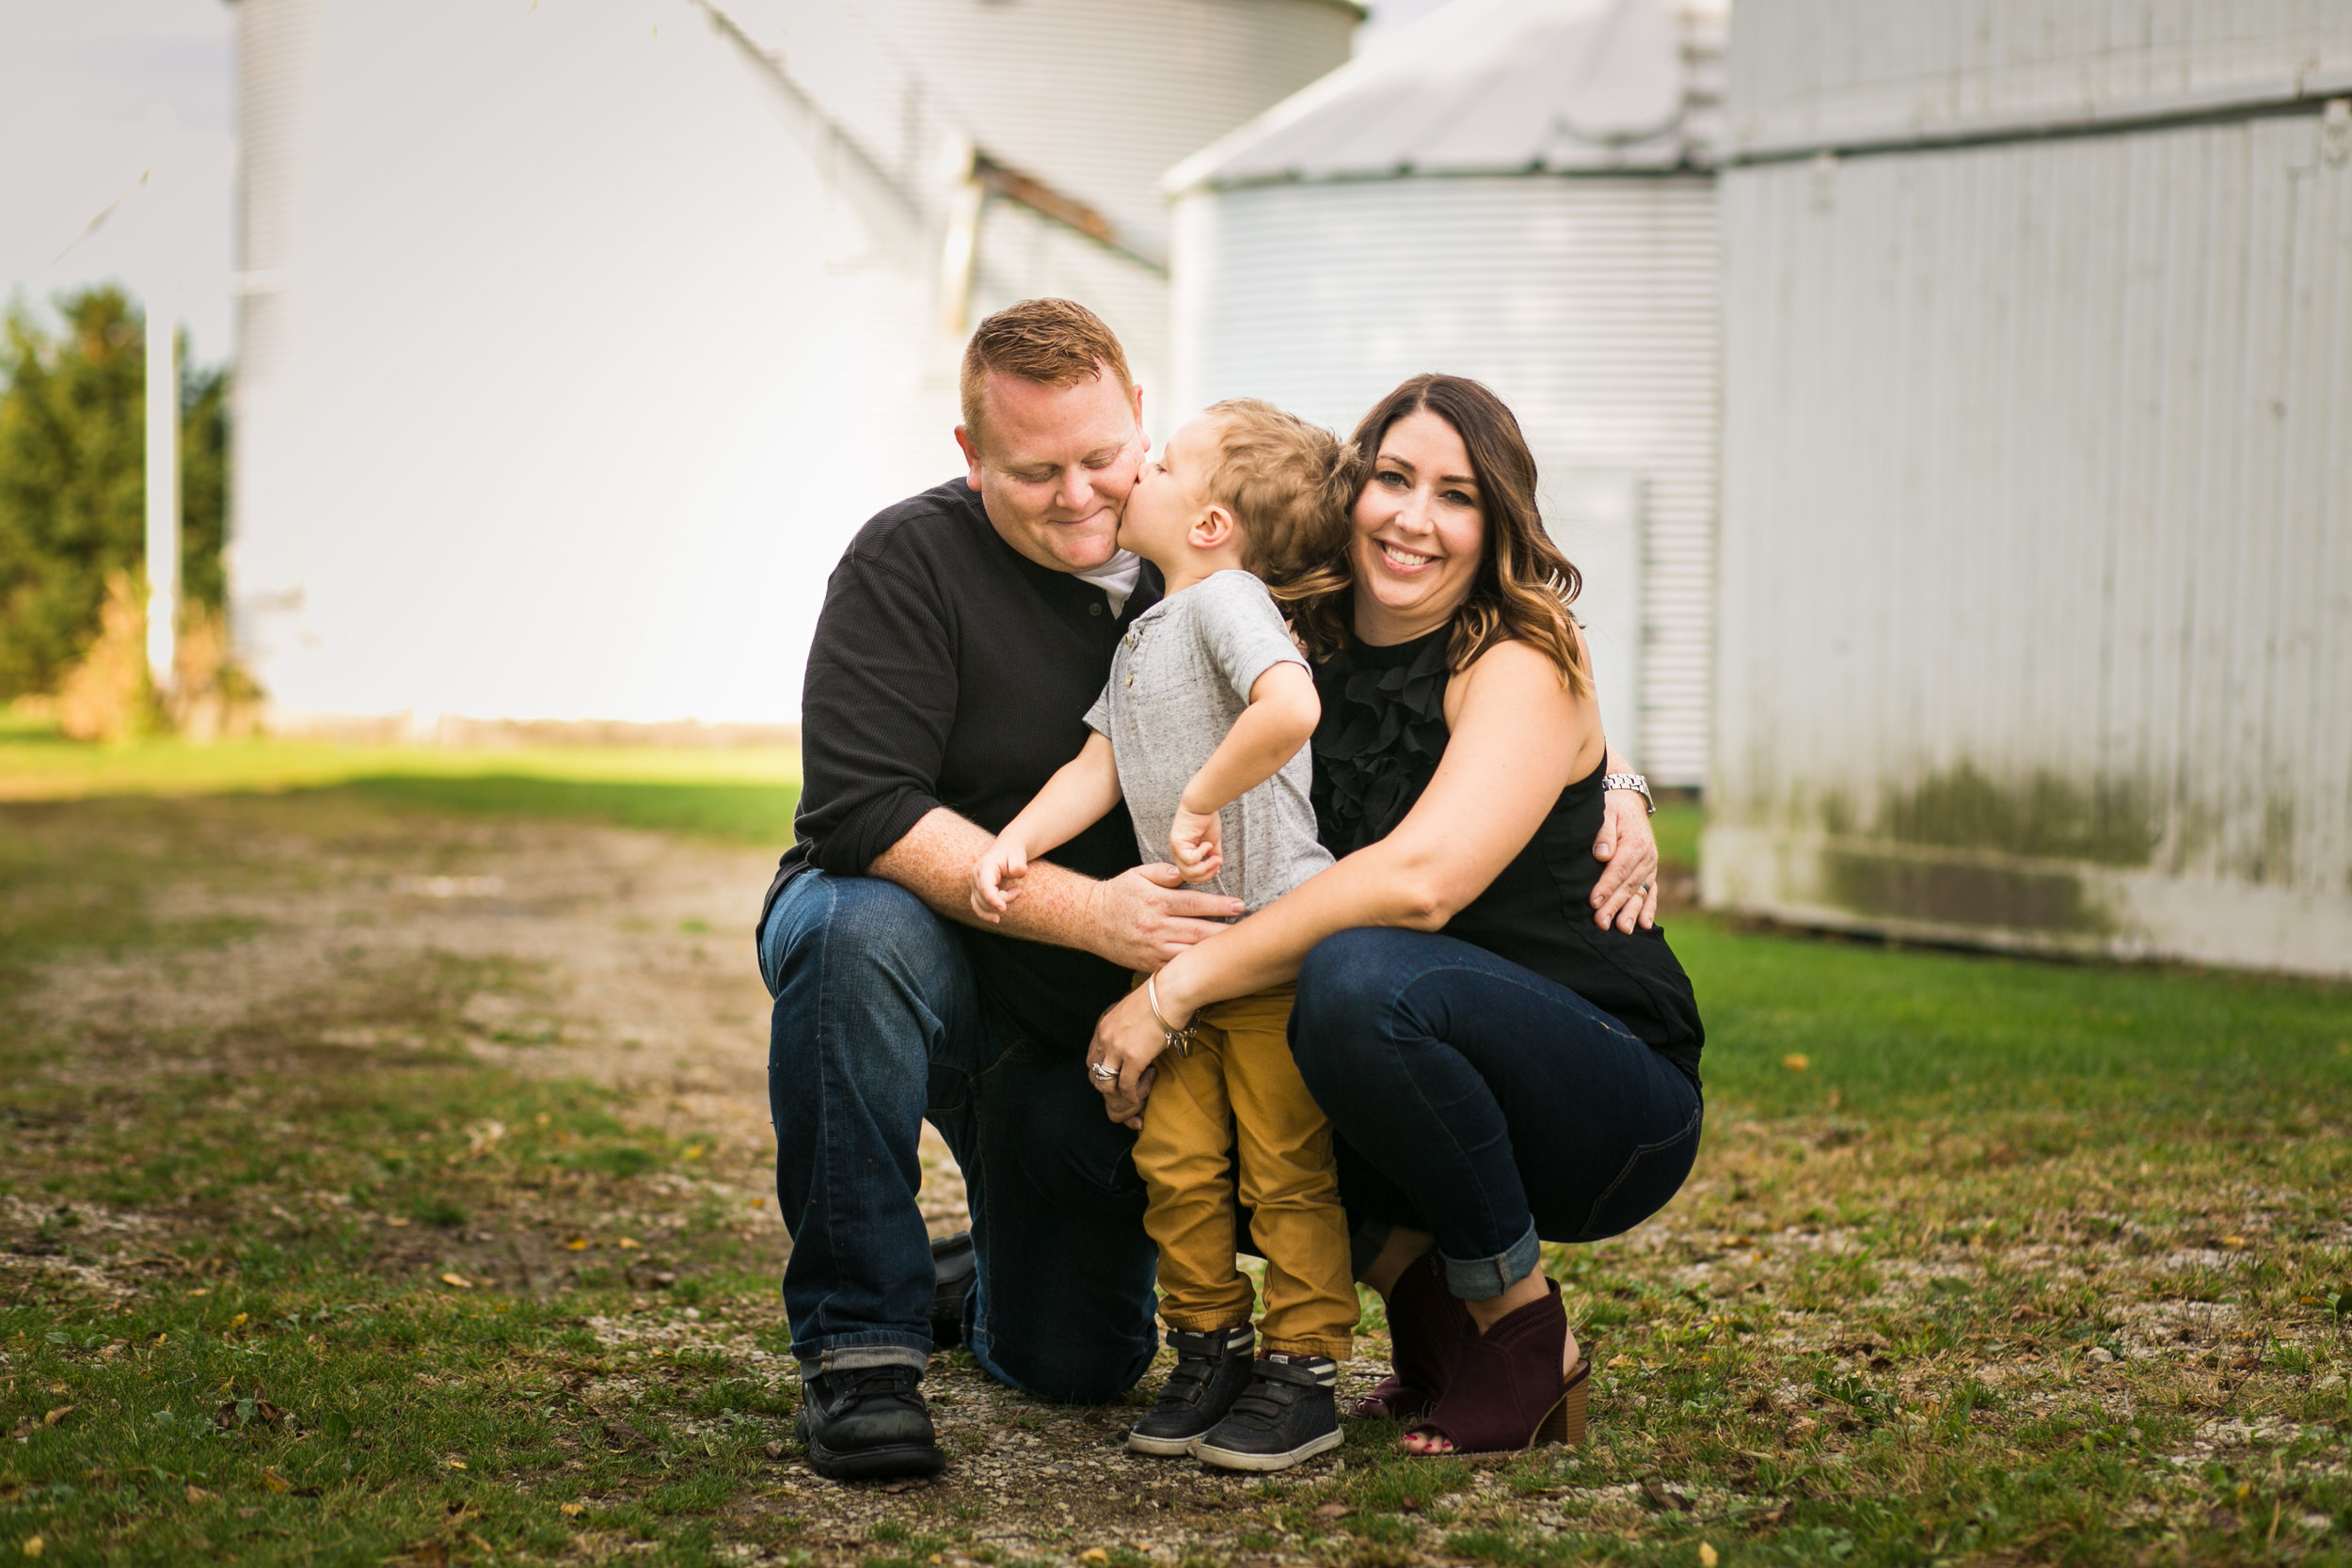 Immediate family photos